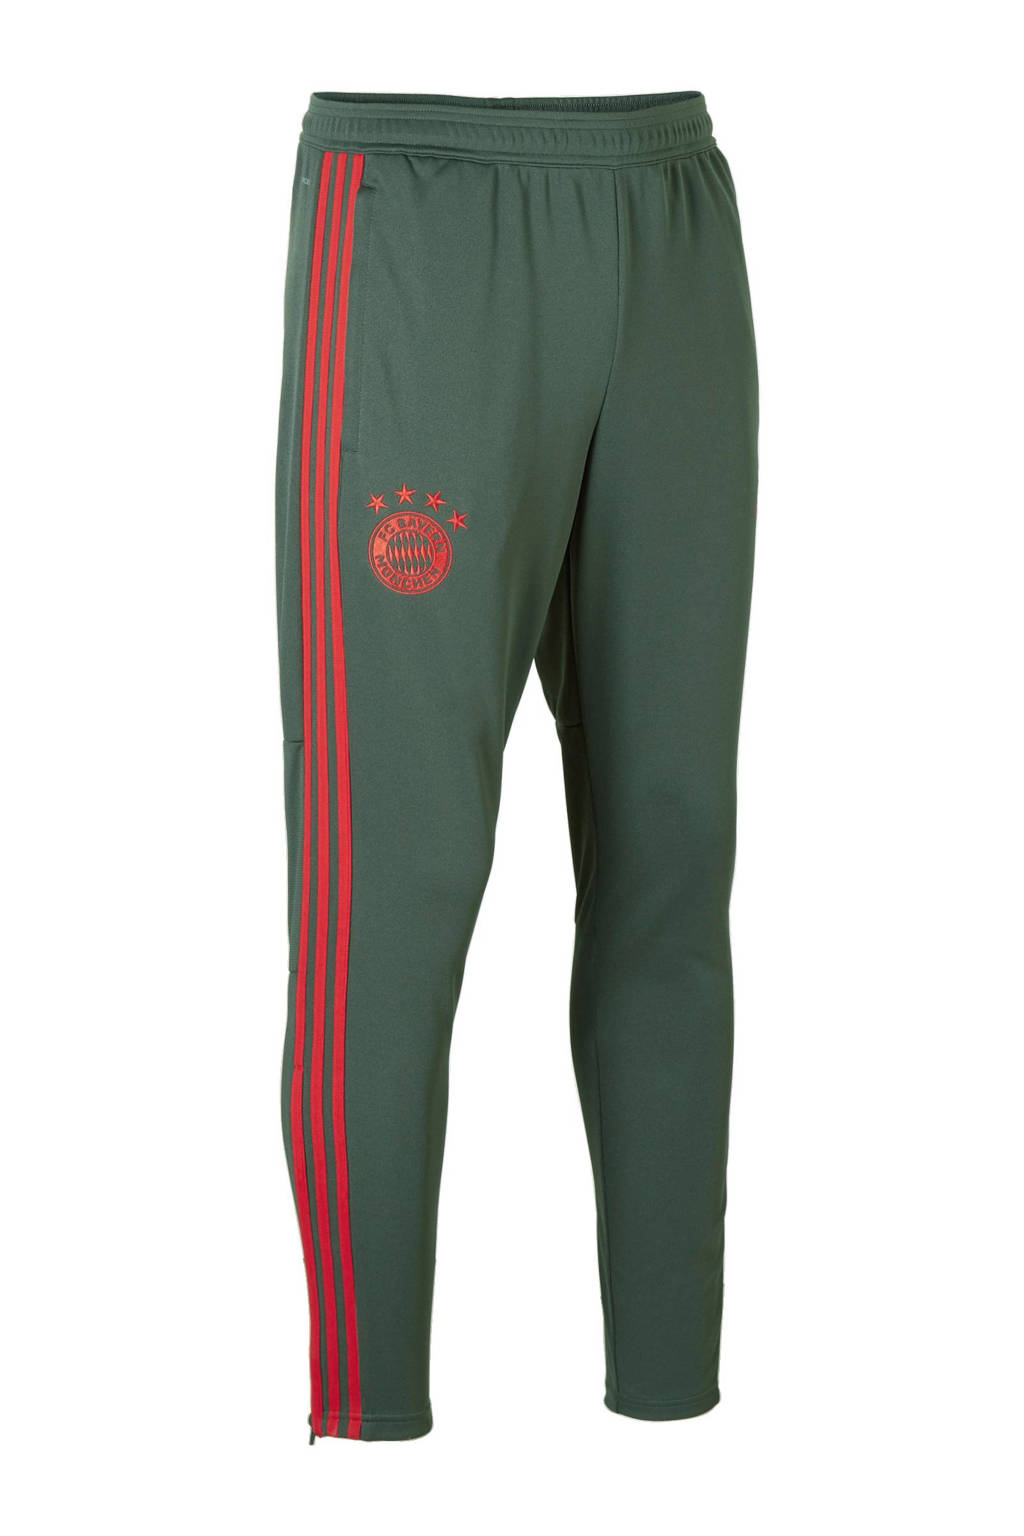 adidas performance Senior FC Bayern München sportbroek 7/8, Donkergroen/ rood